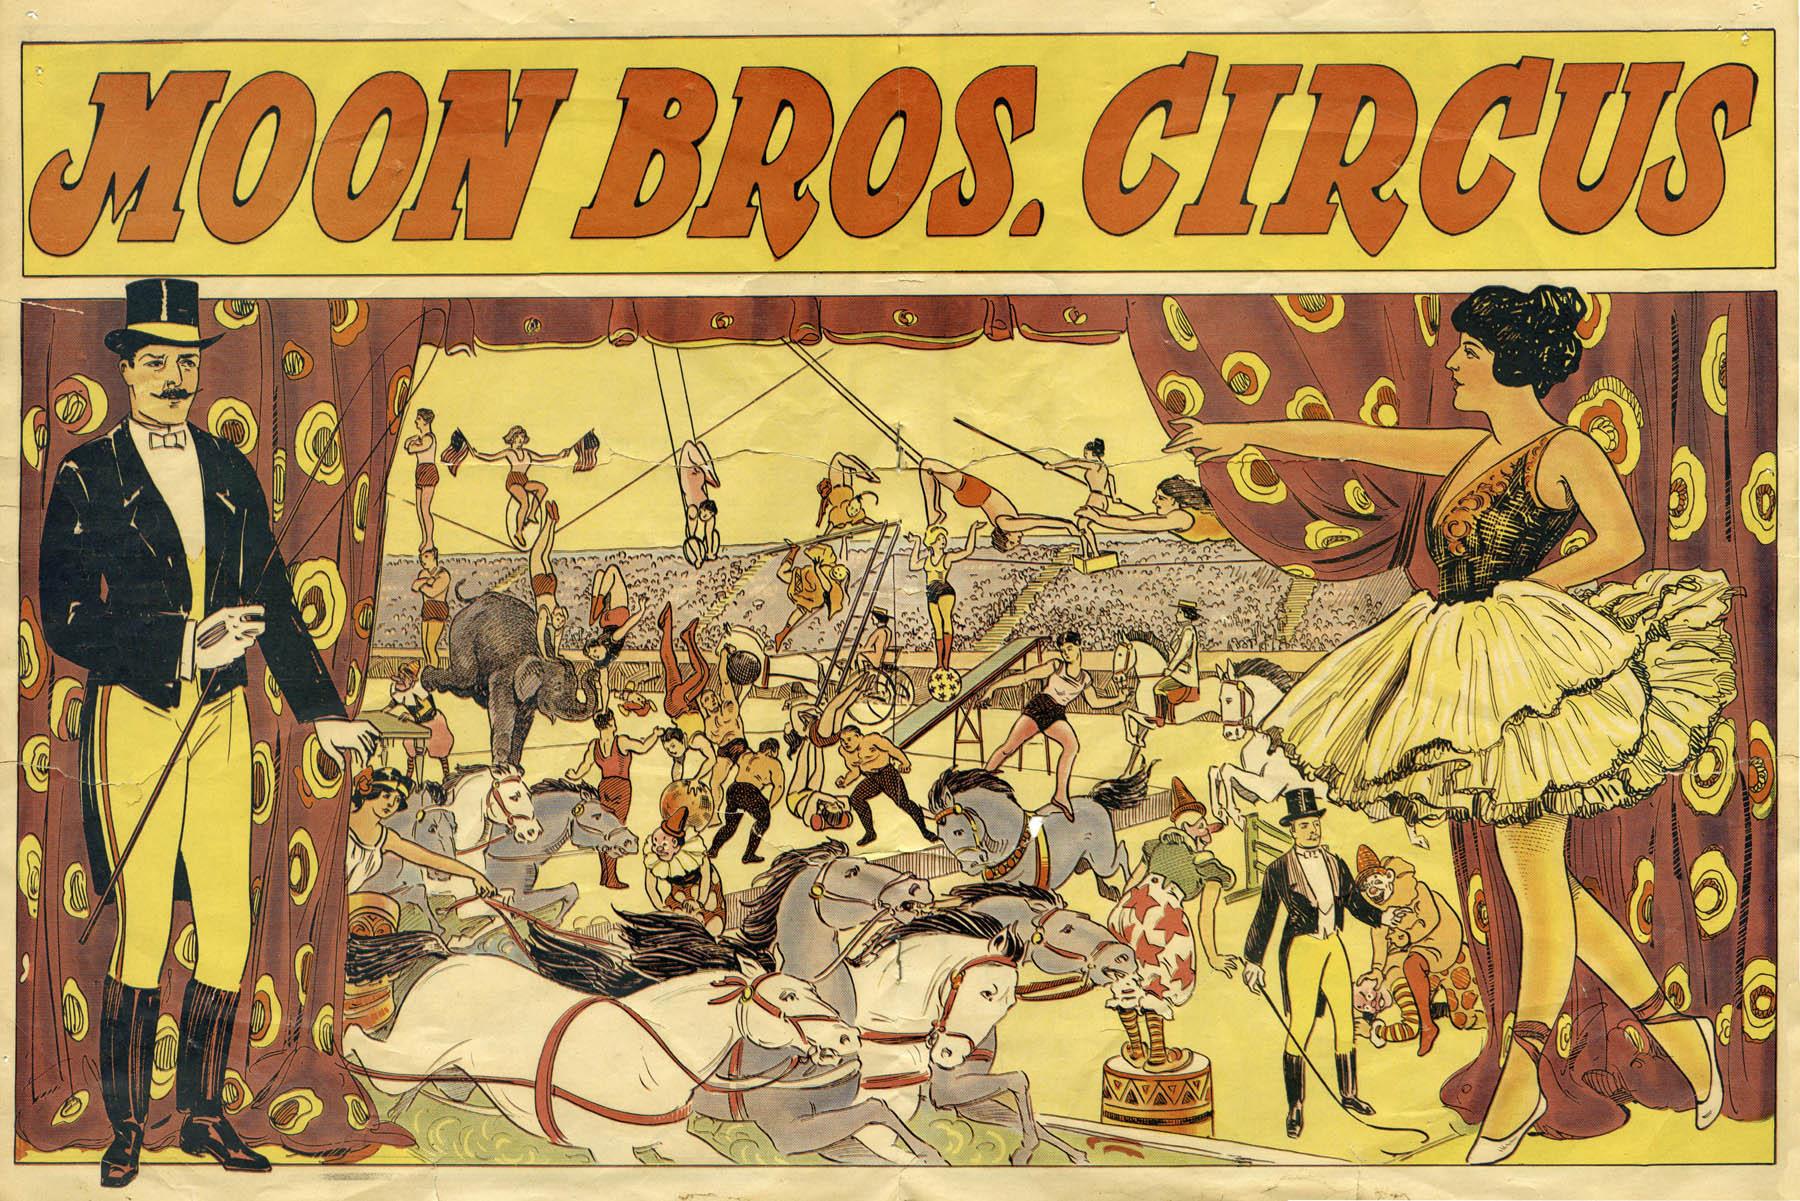 Moon Bros. Circus Poster, 1924